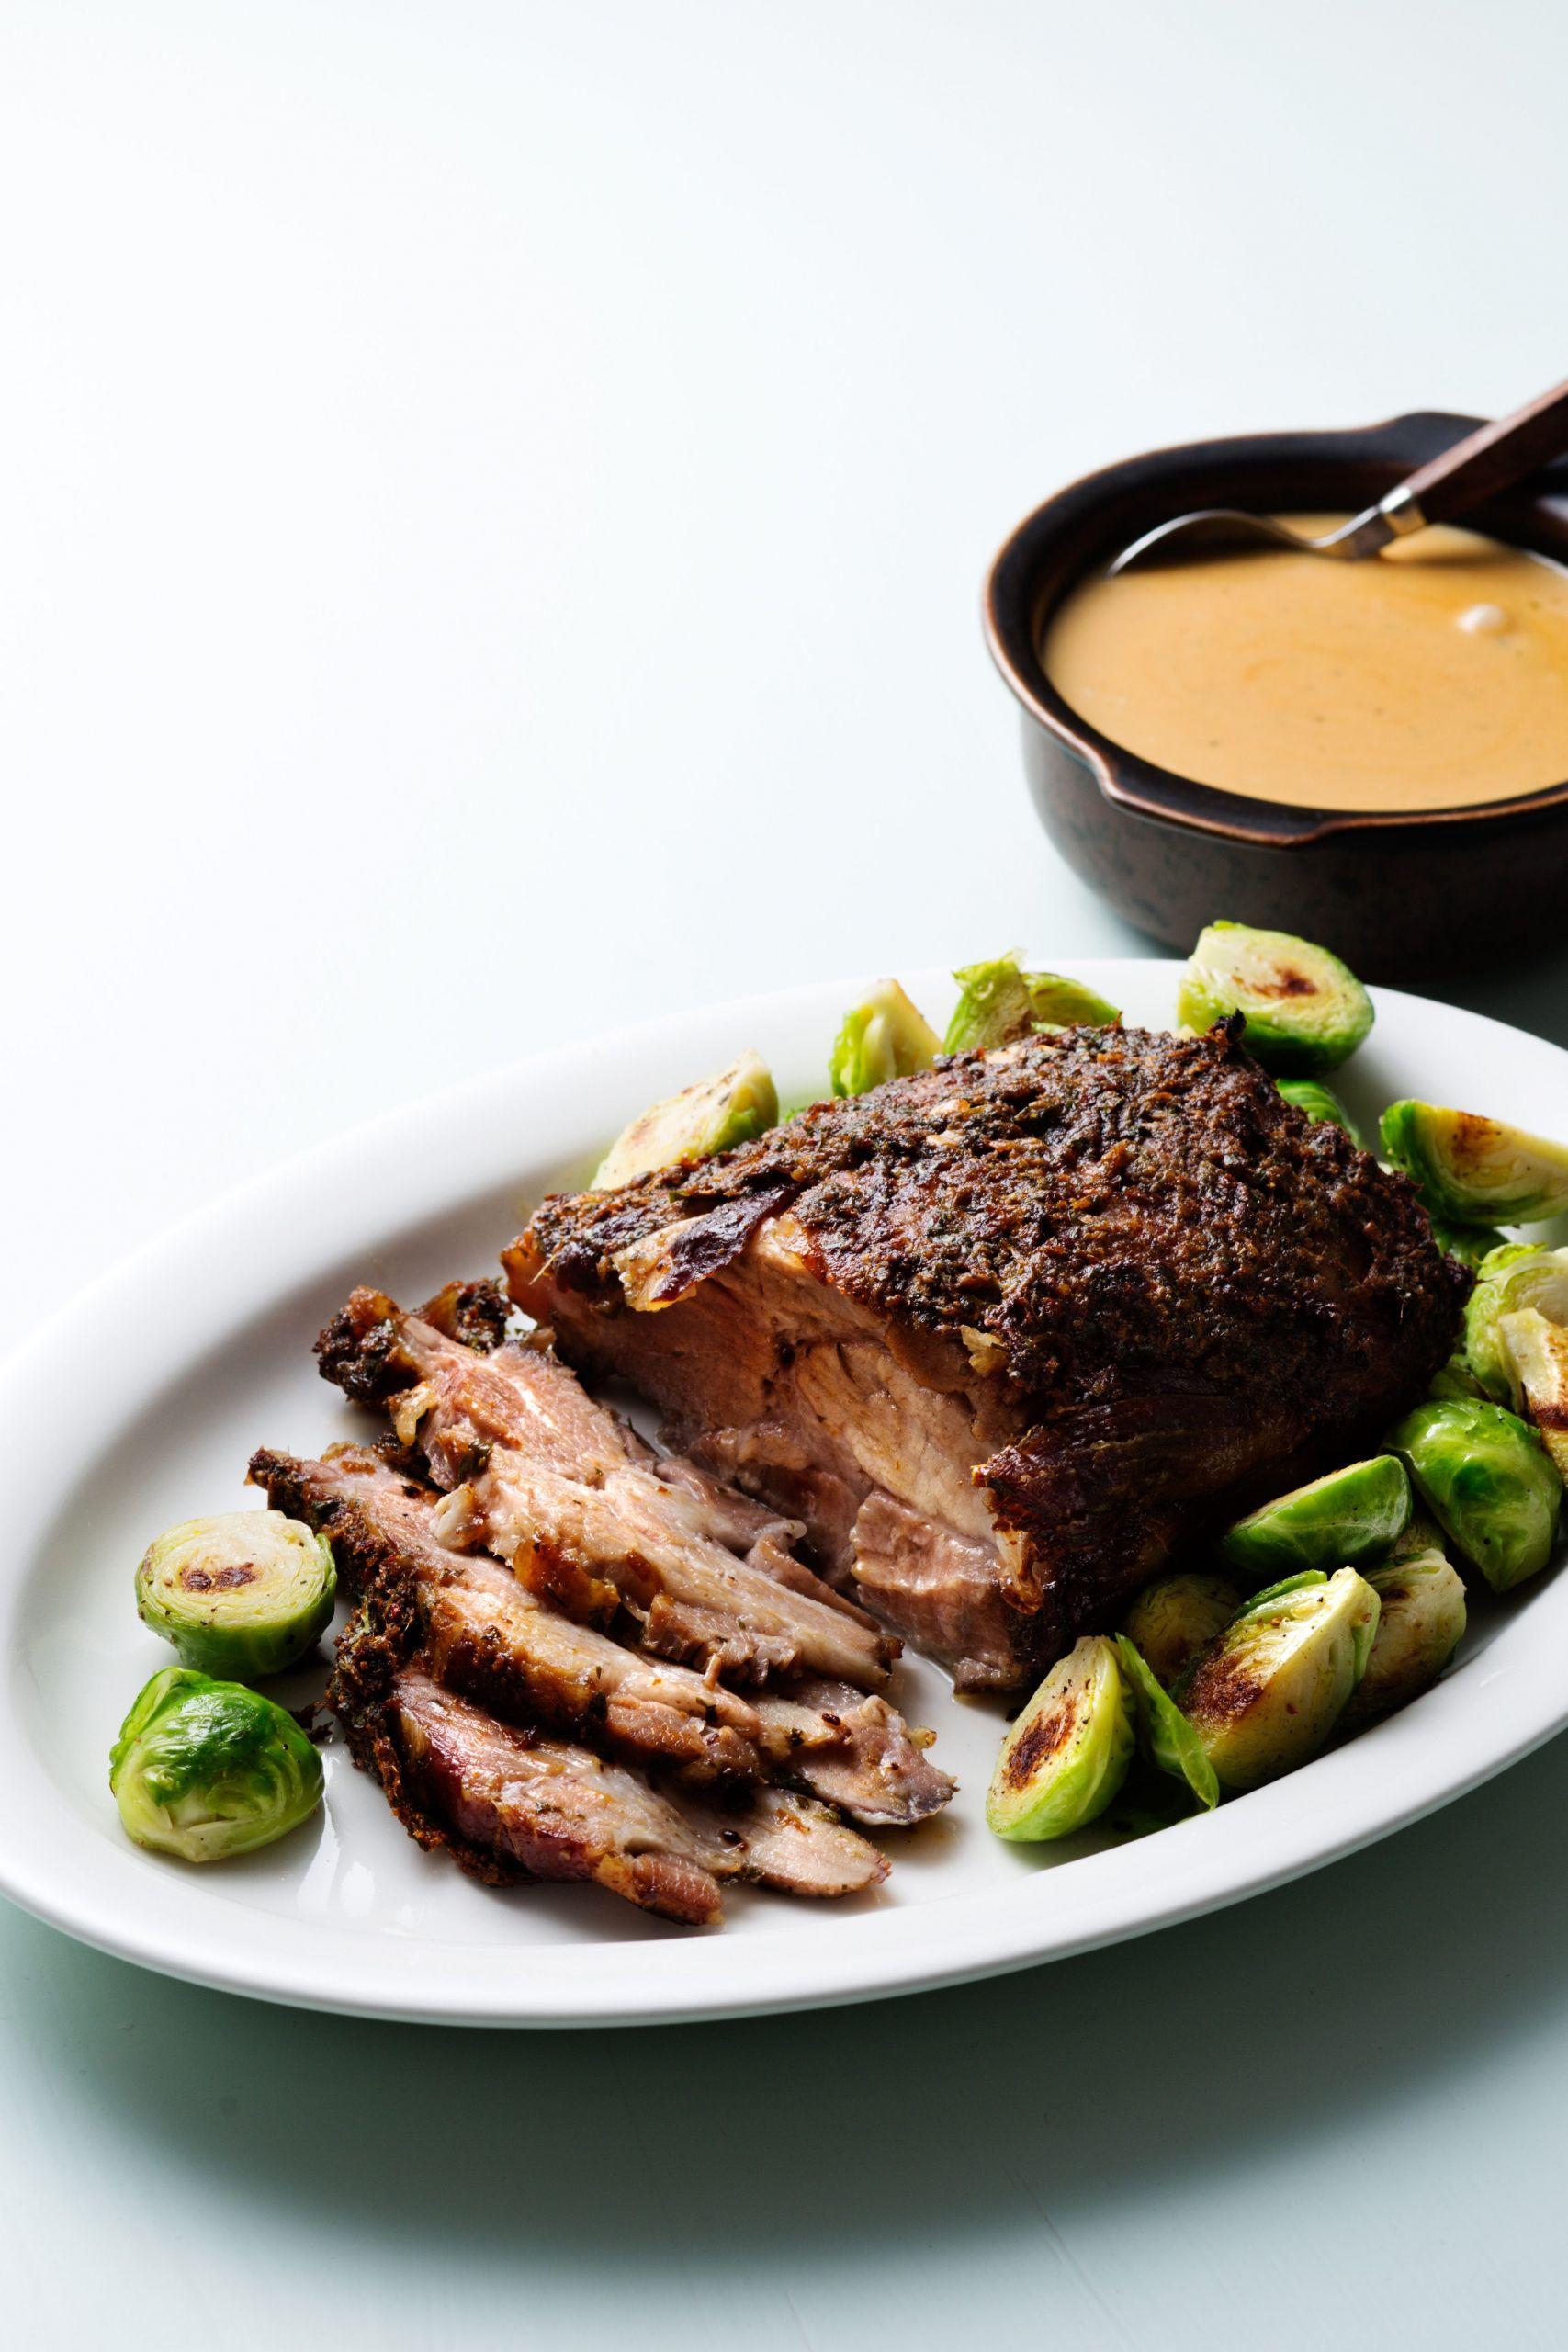 Pork Roast Crock Pot Recipes Slow Cooker Keto  Slow cooked keto pork roast with creamy gravy Diet Doctor